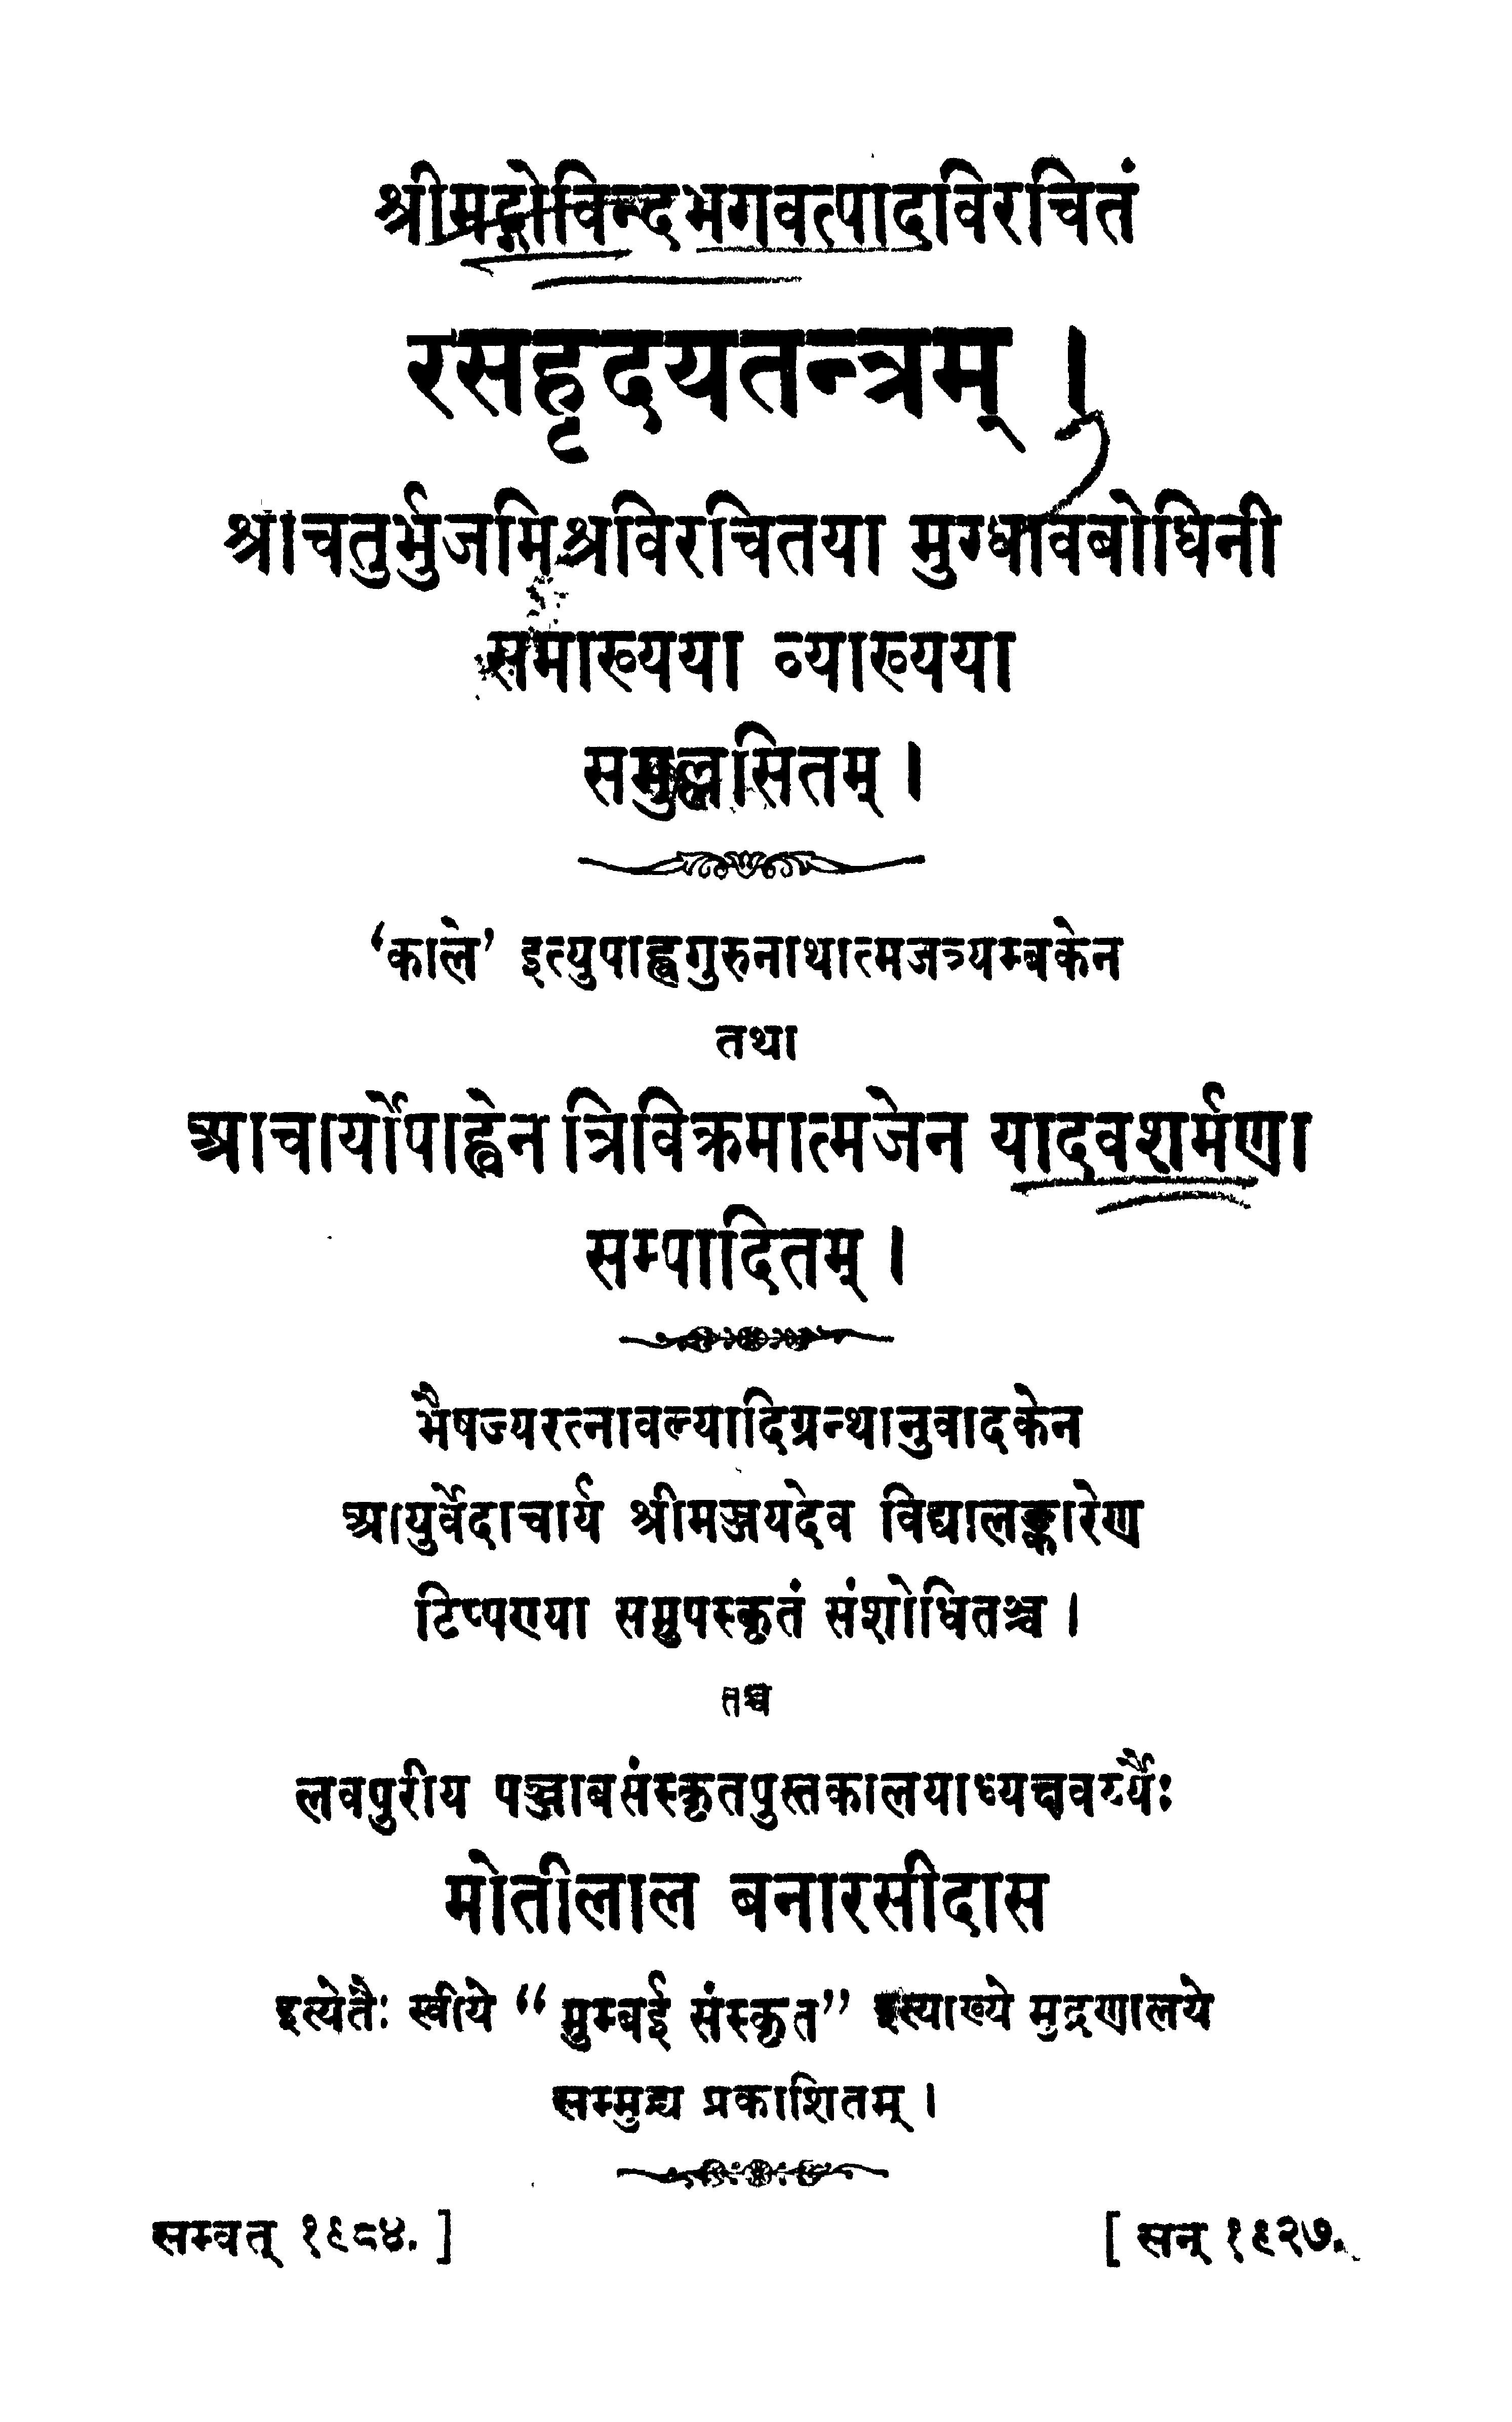 1927 edition of the Rasahrdayatantra by Acharya